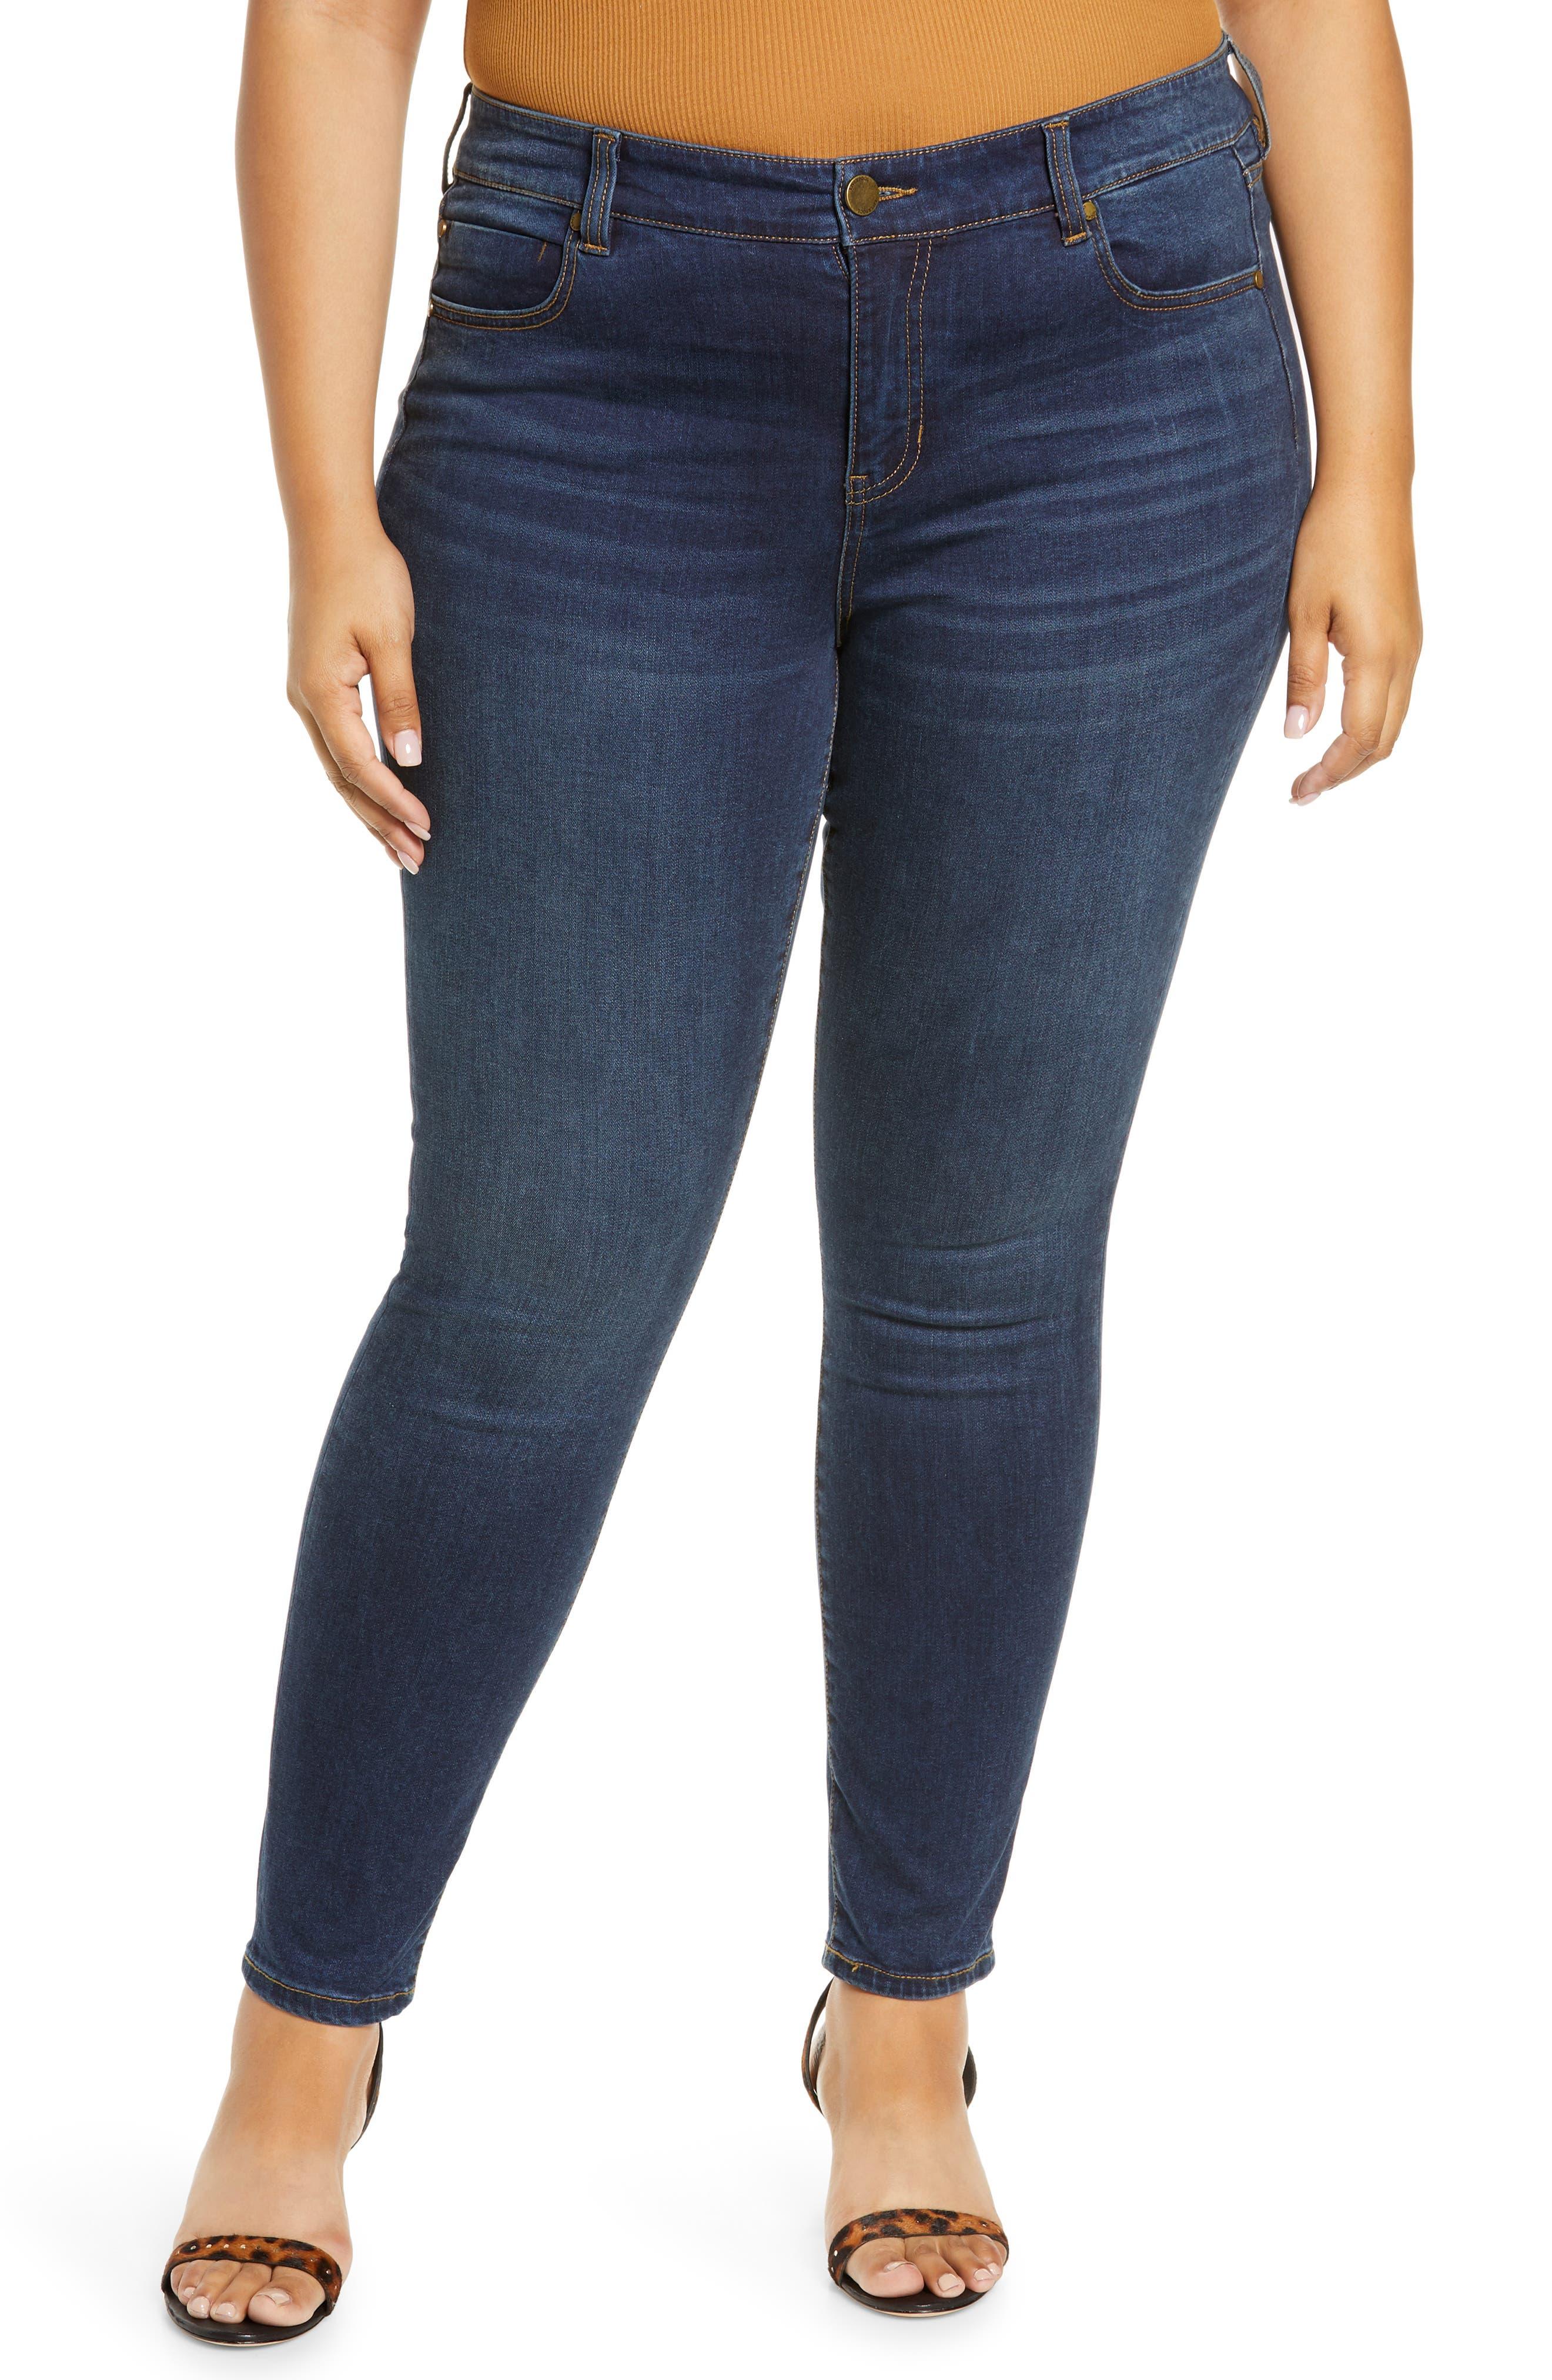 Abby Sustainable High Waist Skinny Jeans